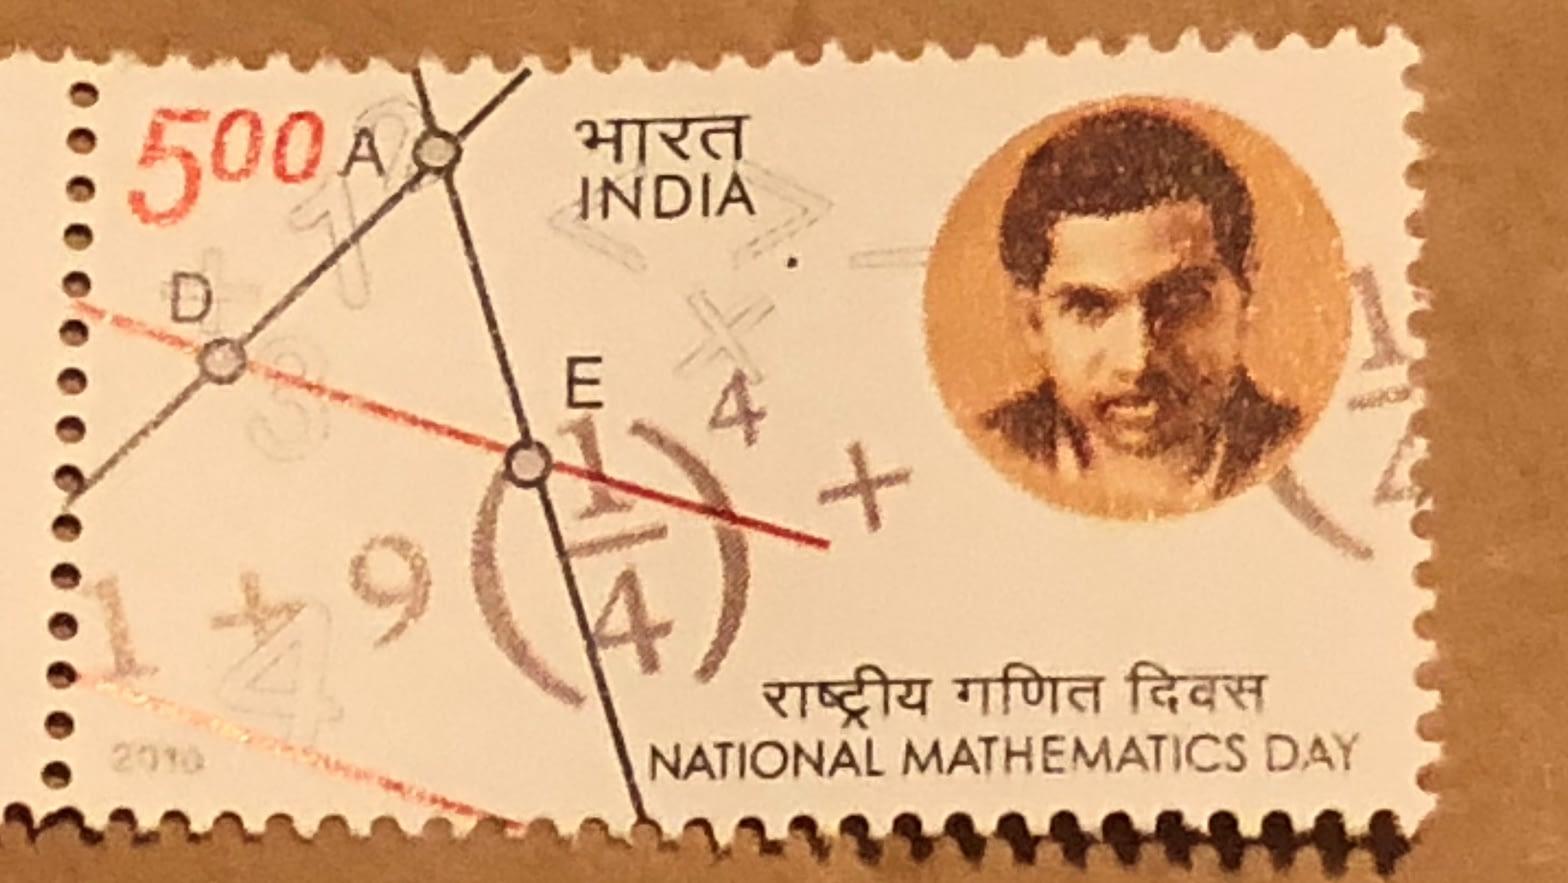 Srinivasa Ramanujan Stamp